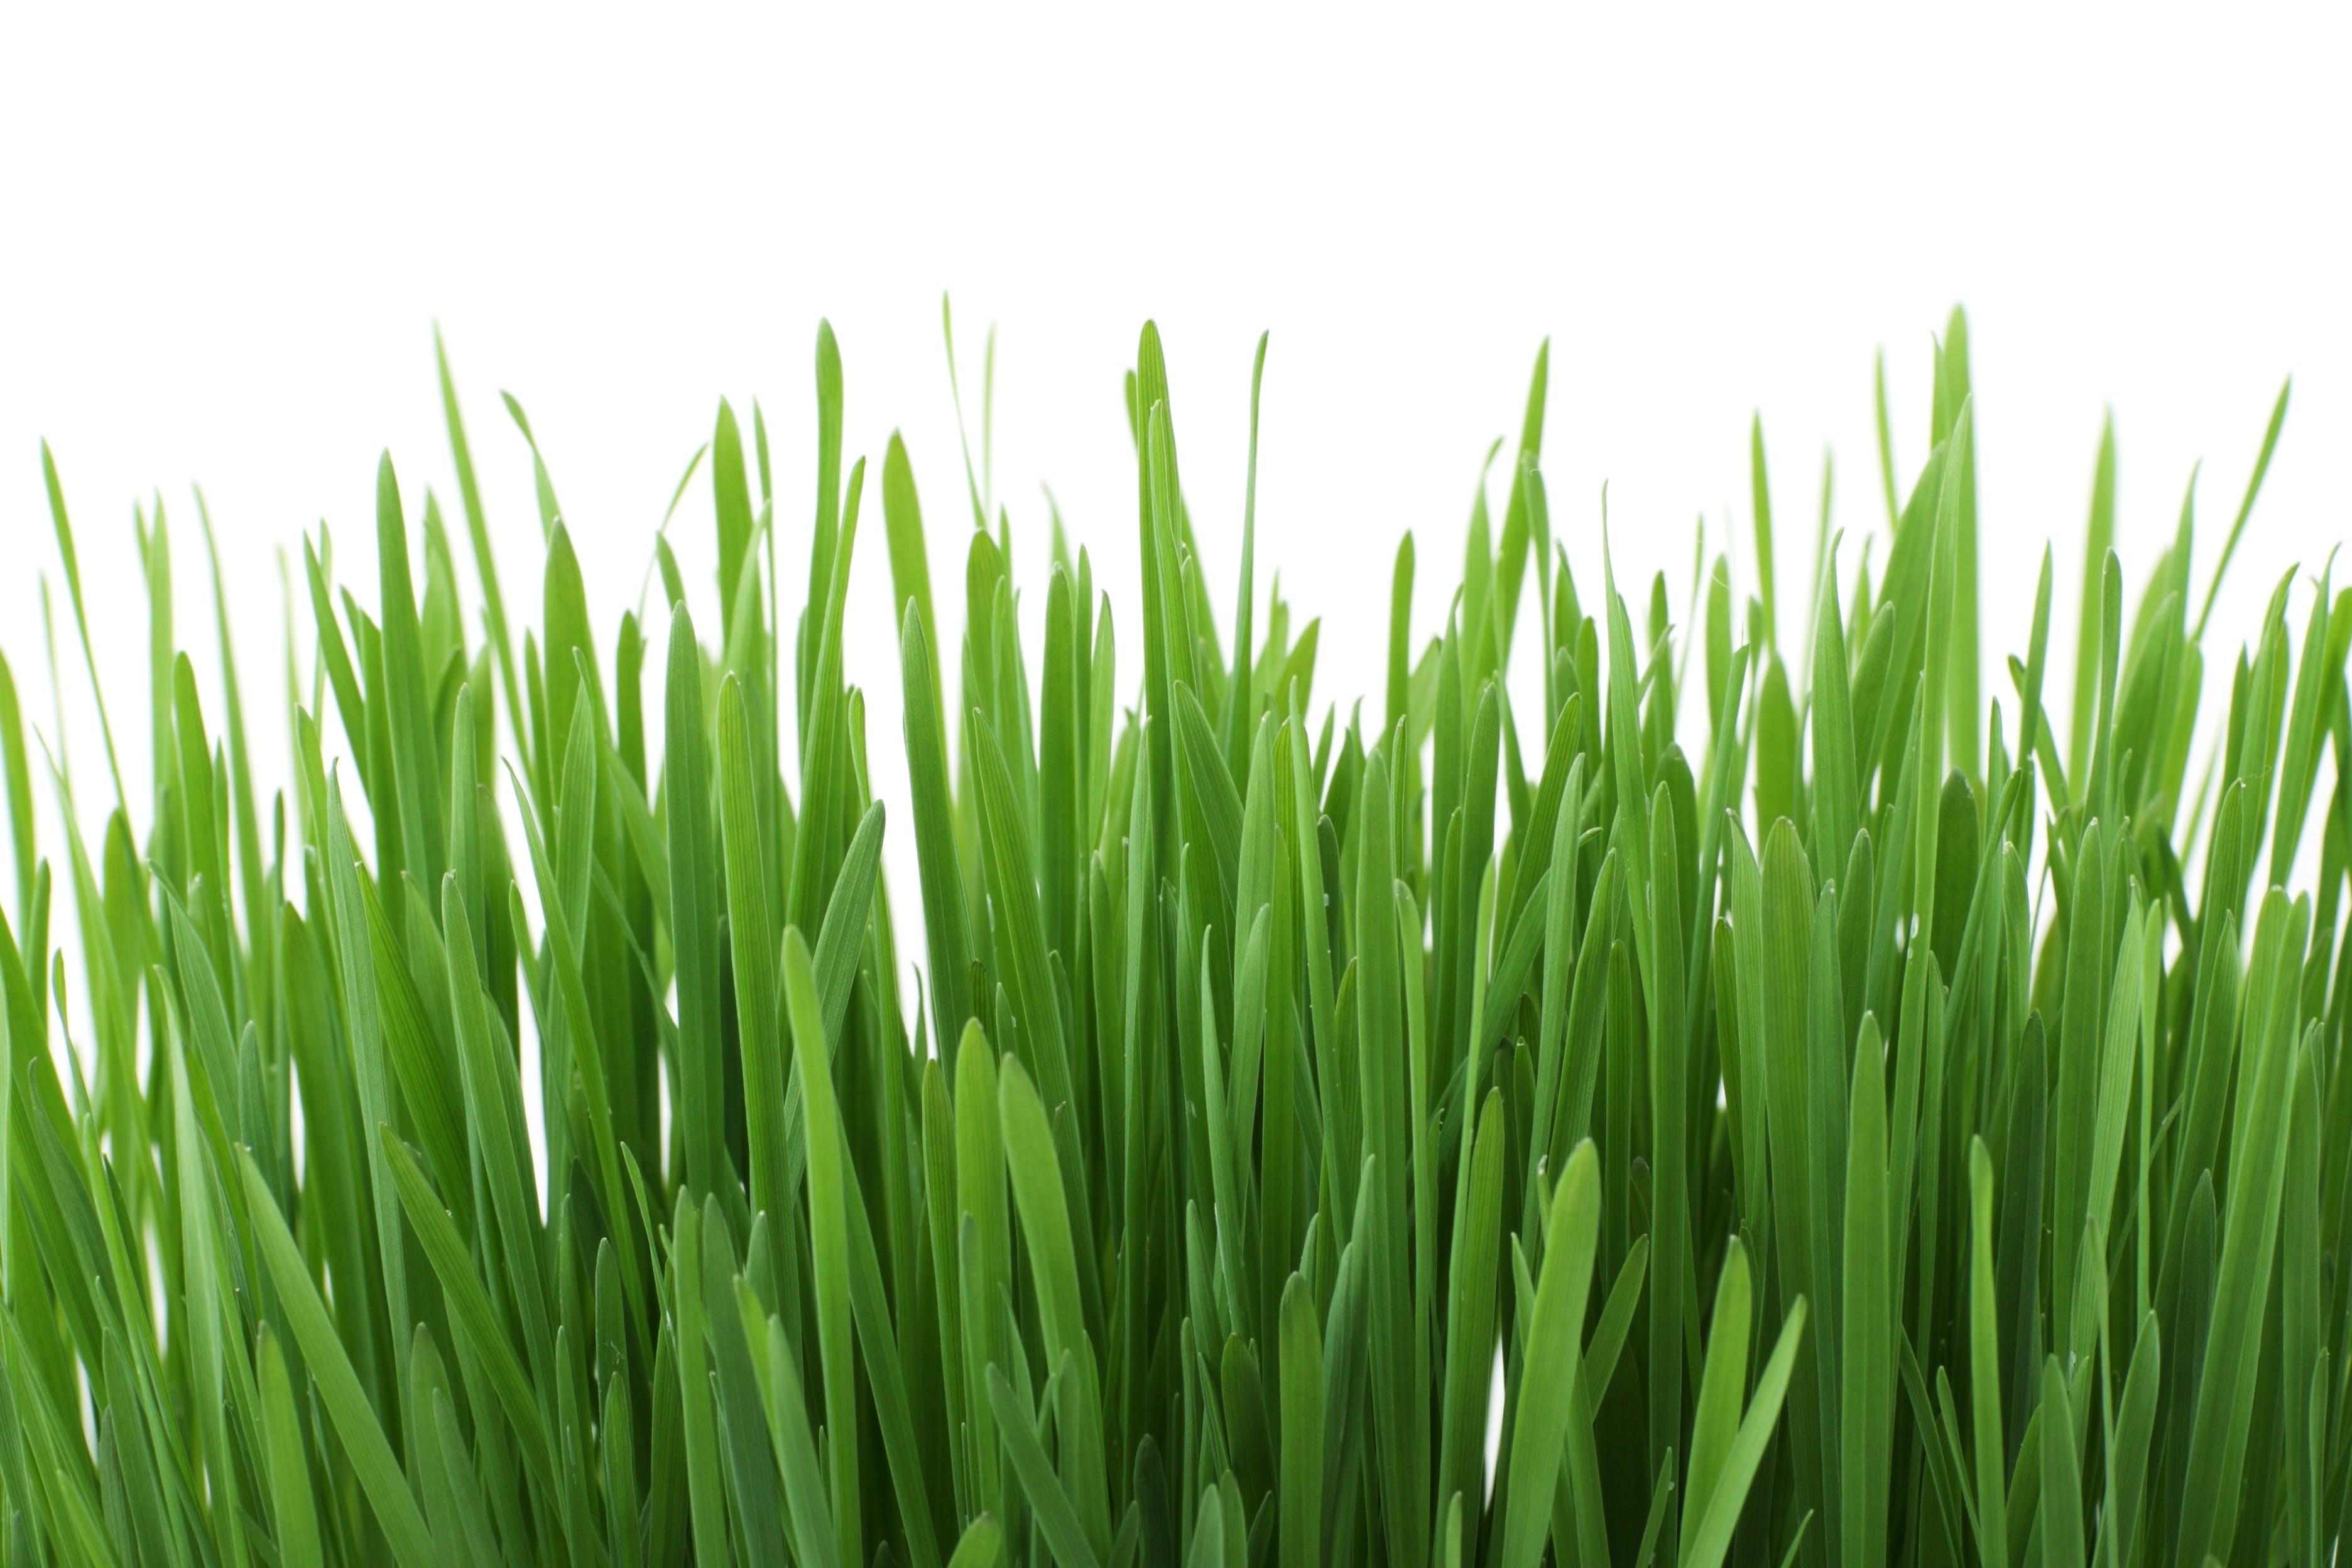 Fotos de stock gratuitas de césped, crecimiento, flora, Fresco